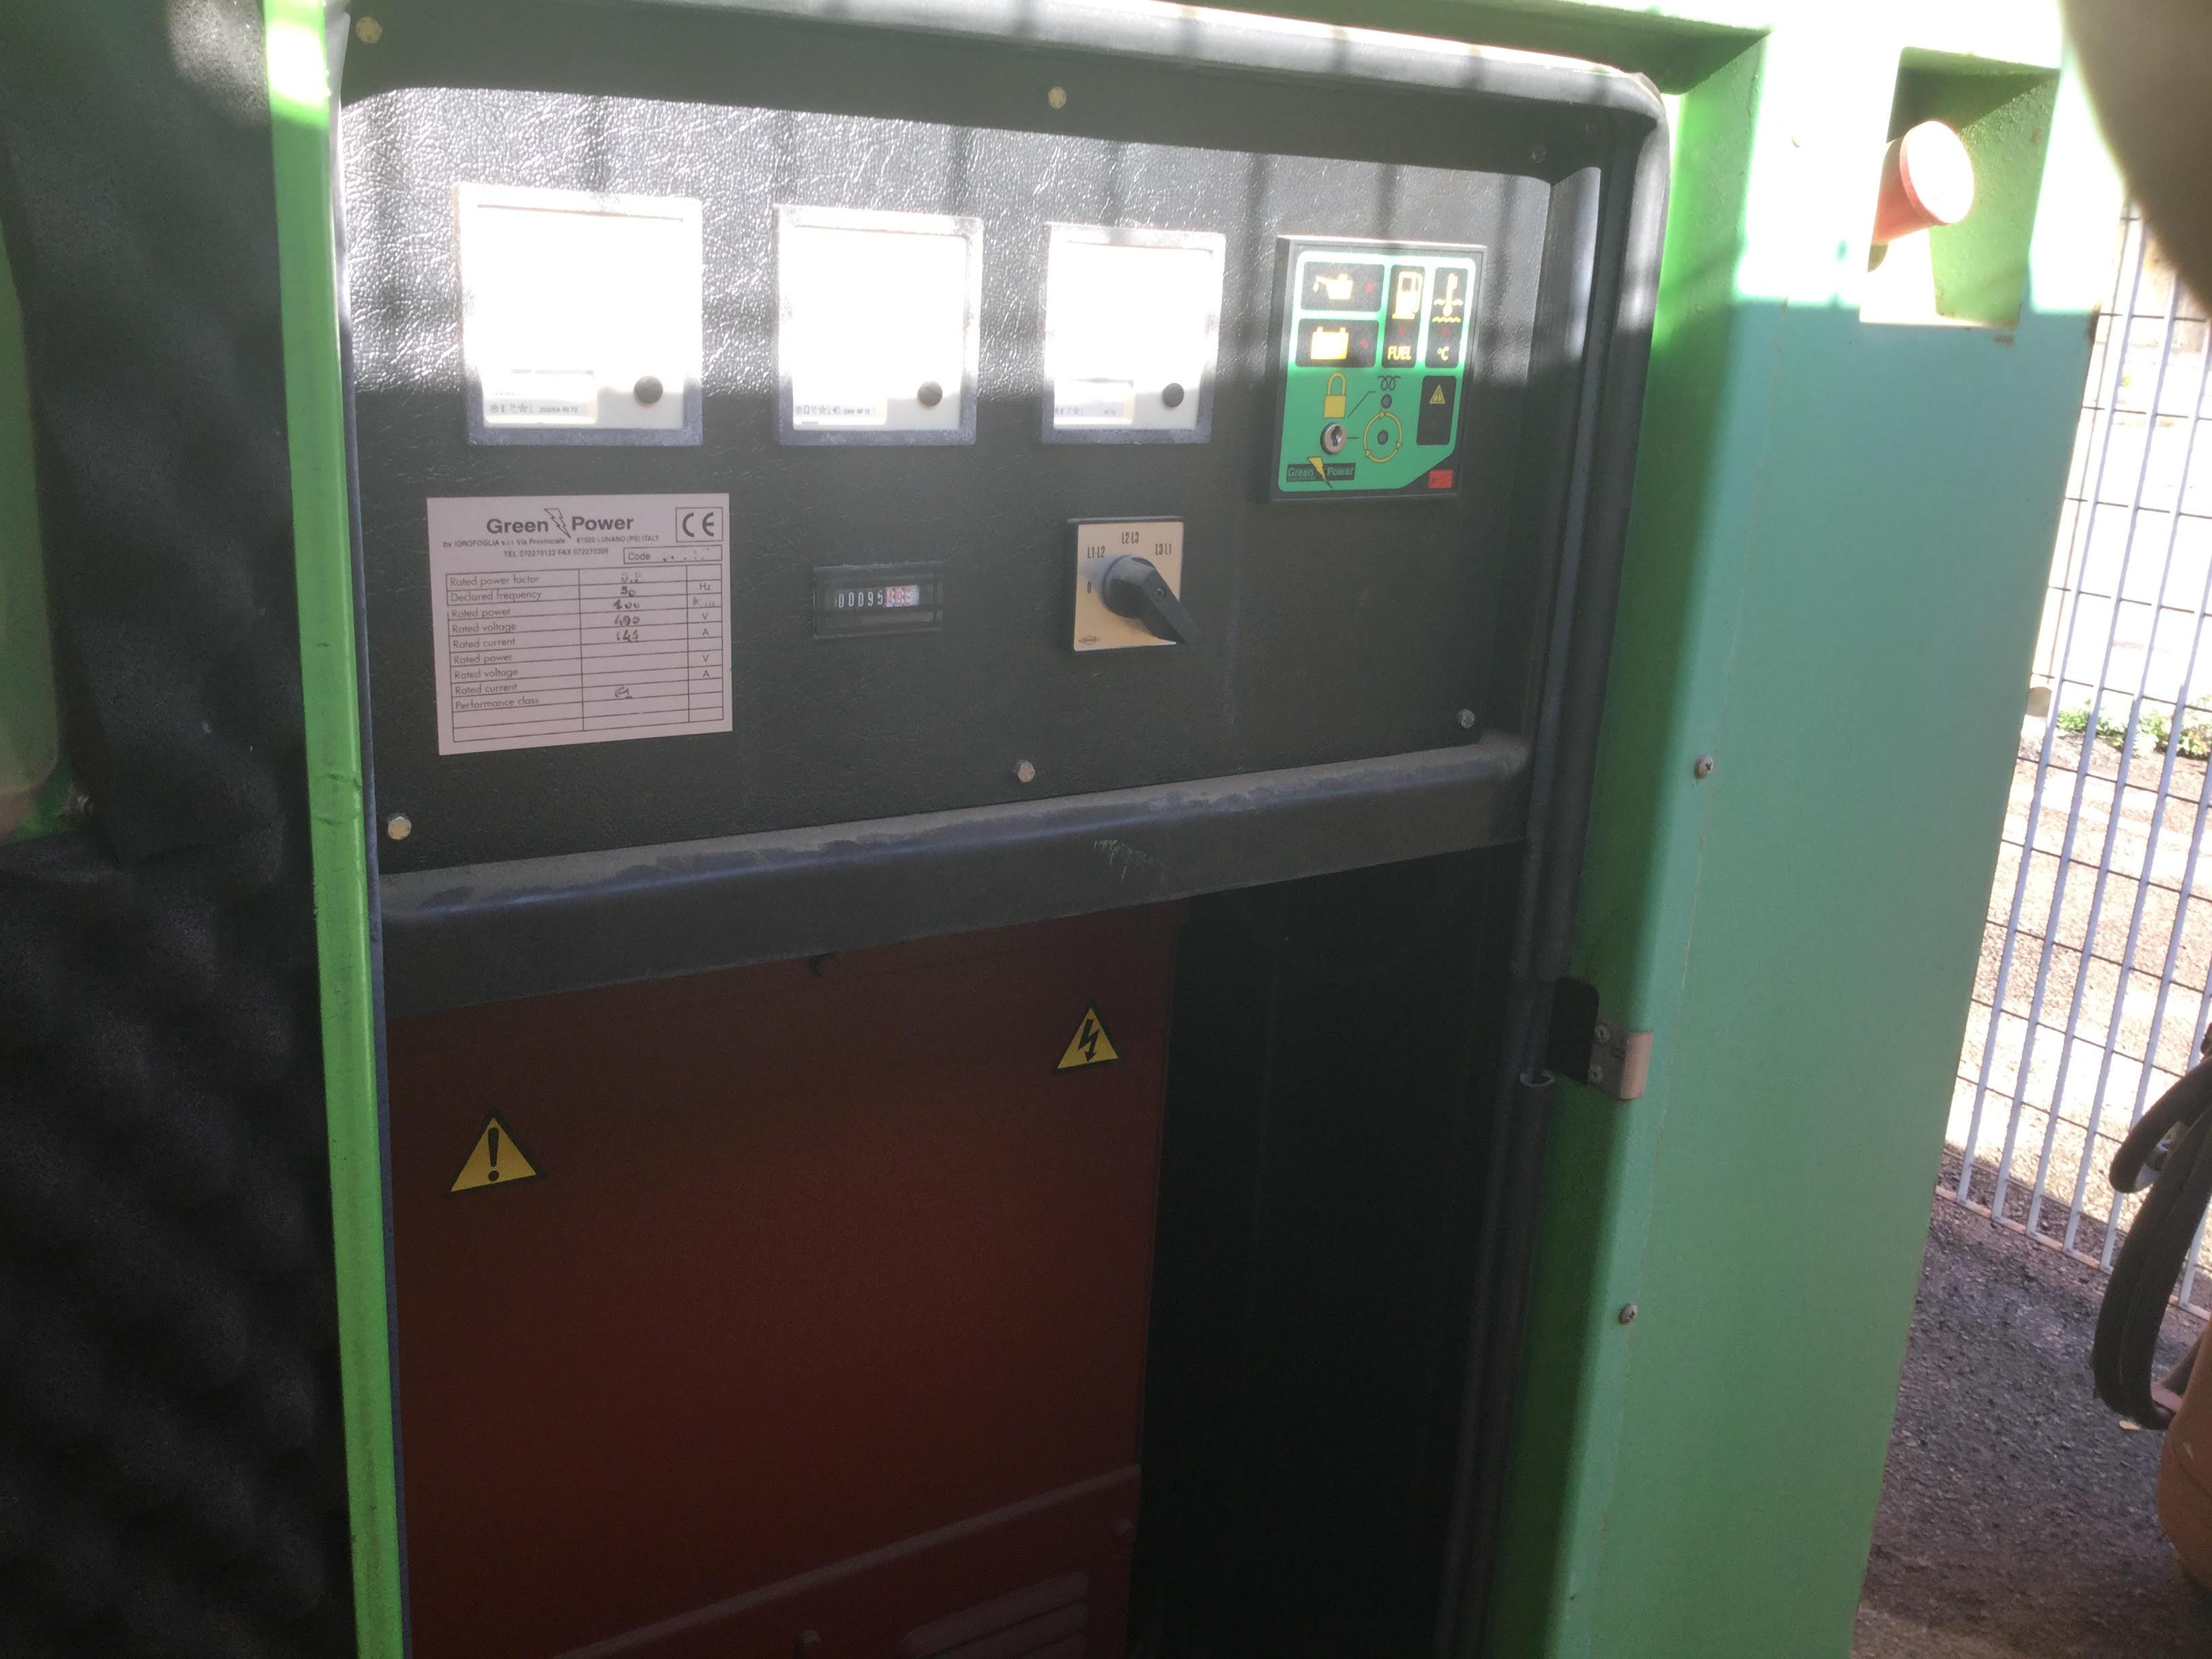 Gruppo elettrogeno green power 100 kw macchinari usati for Gruppi elettrogeni usati 10 kw